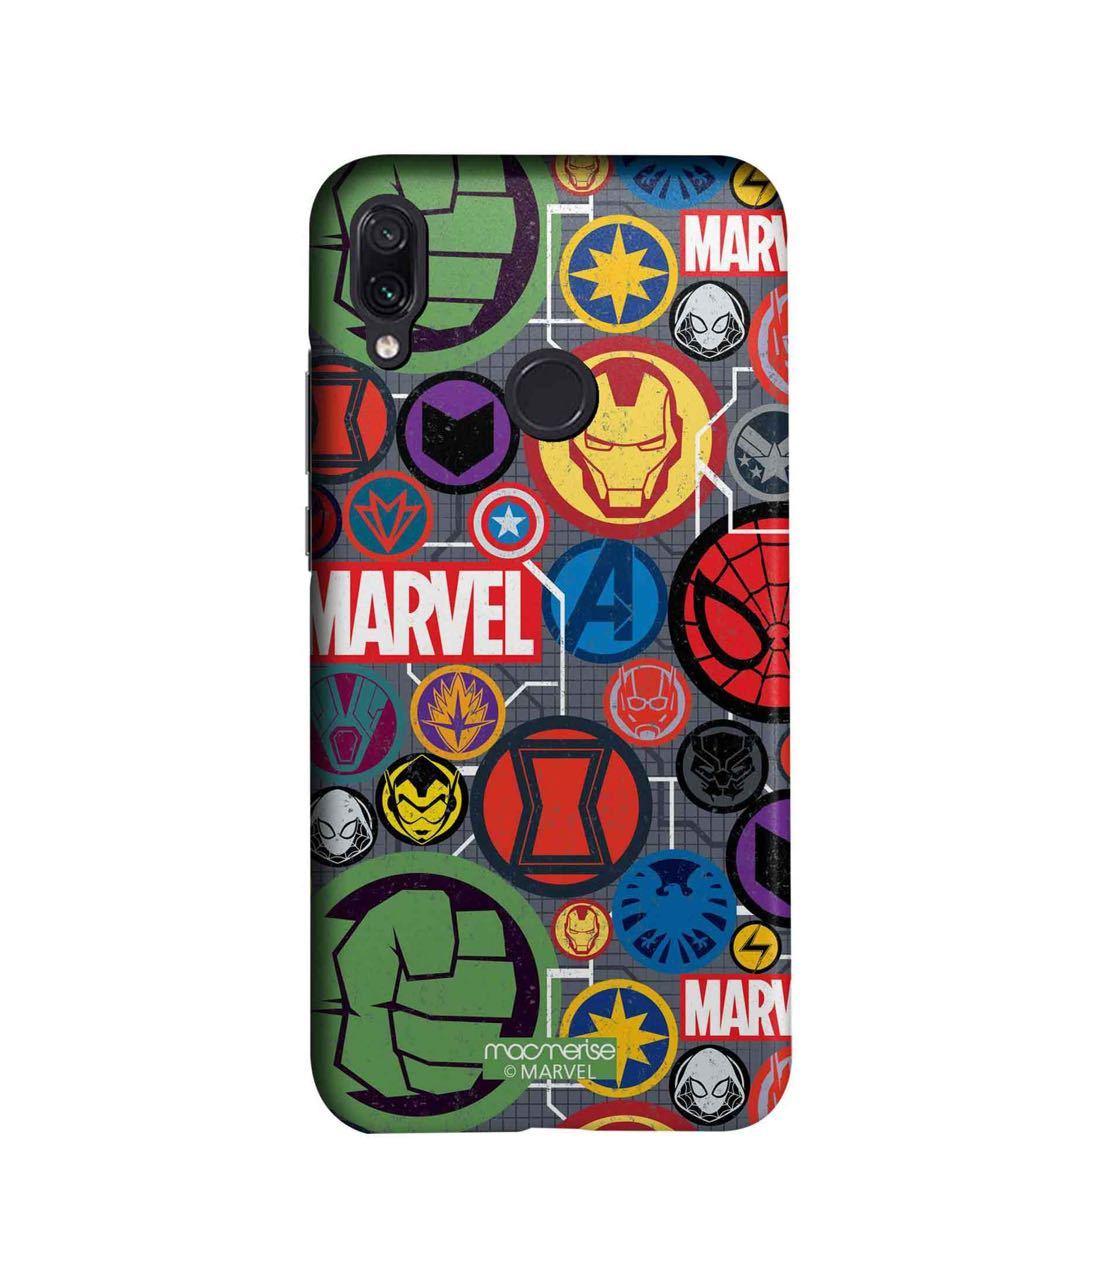 Marvel Iconic Mashup - Sleek Phone Case for Xiaomi Redmi Note 7